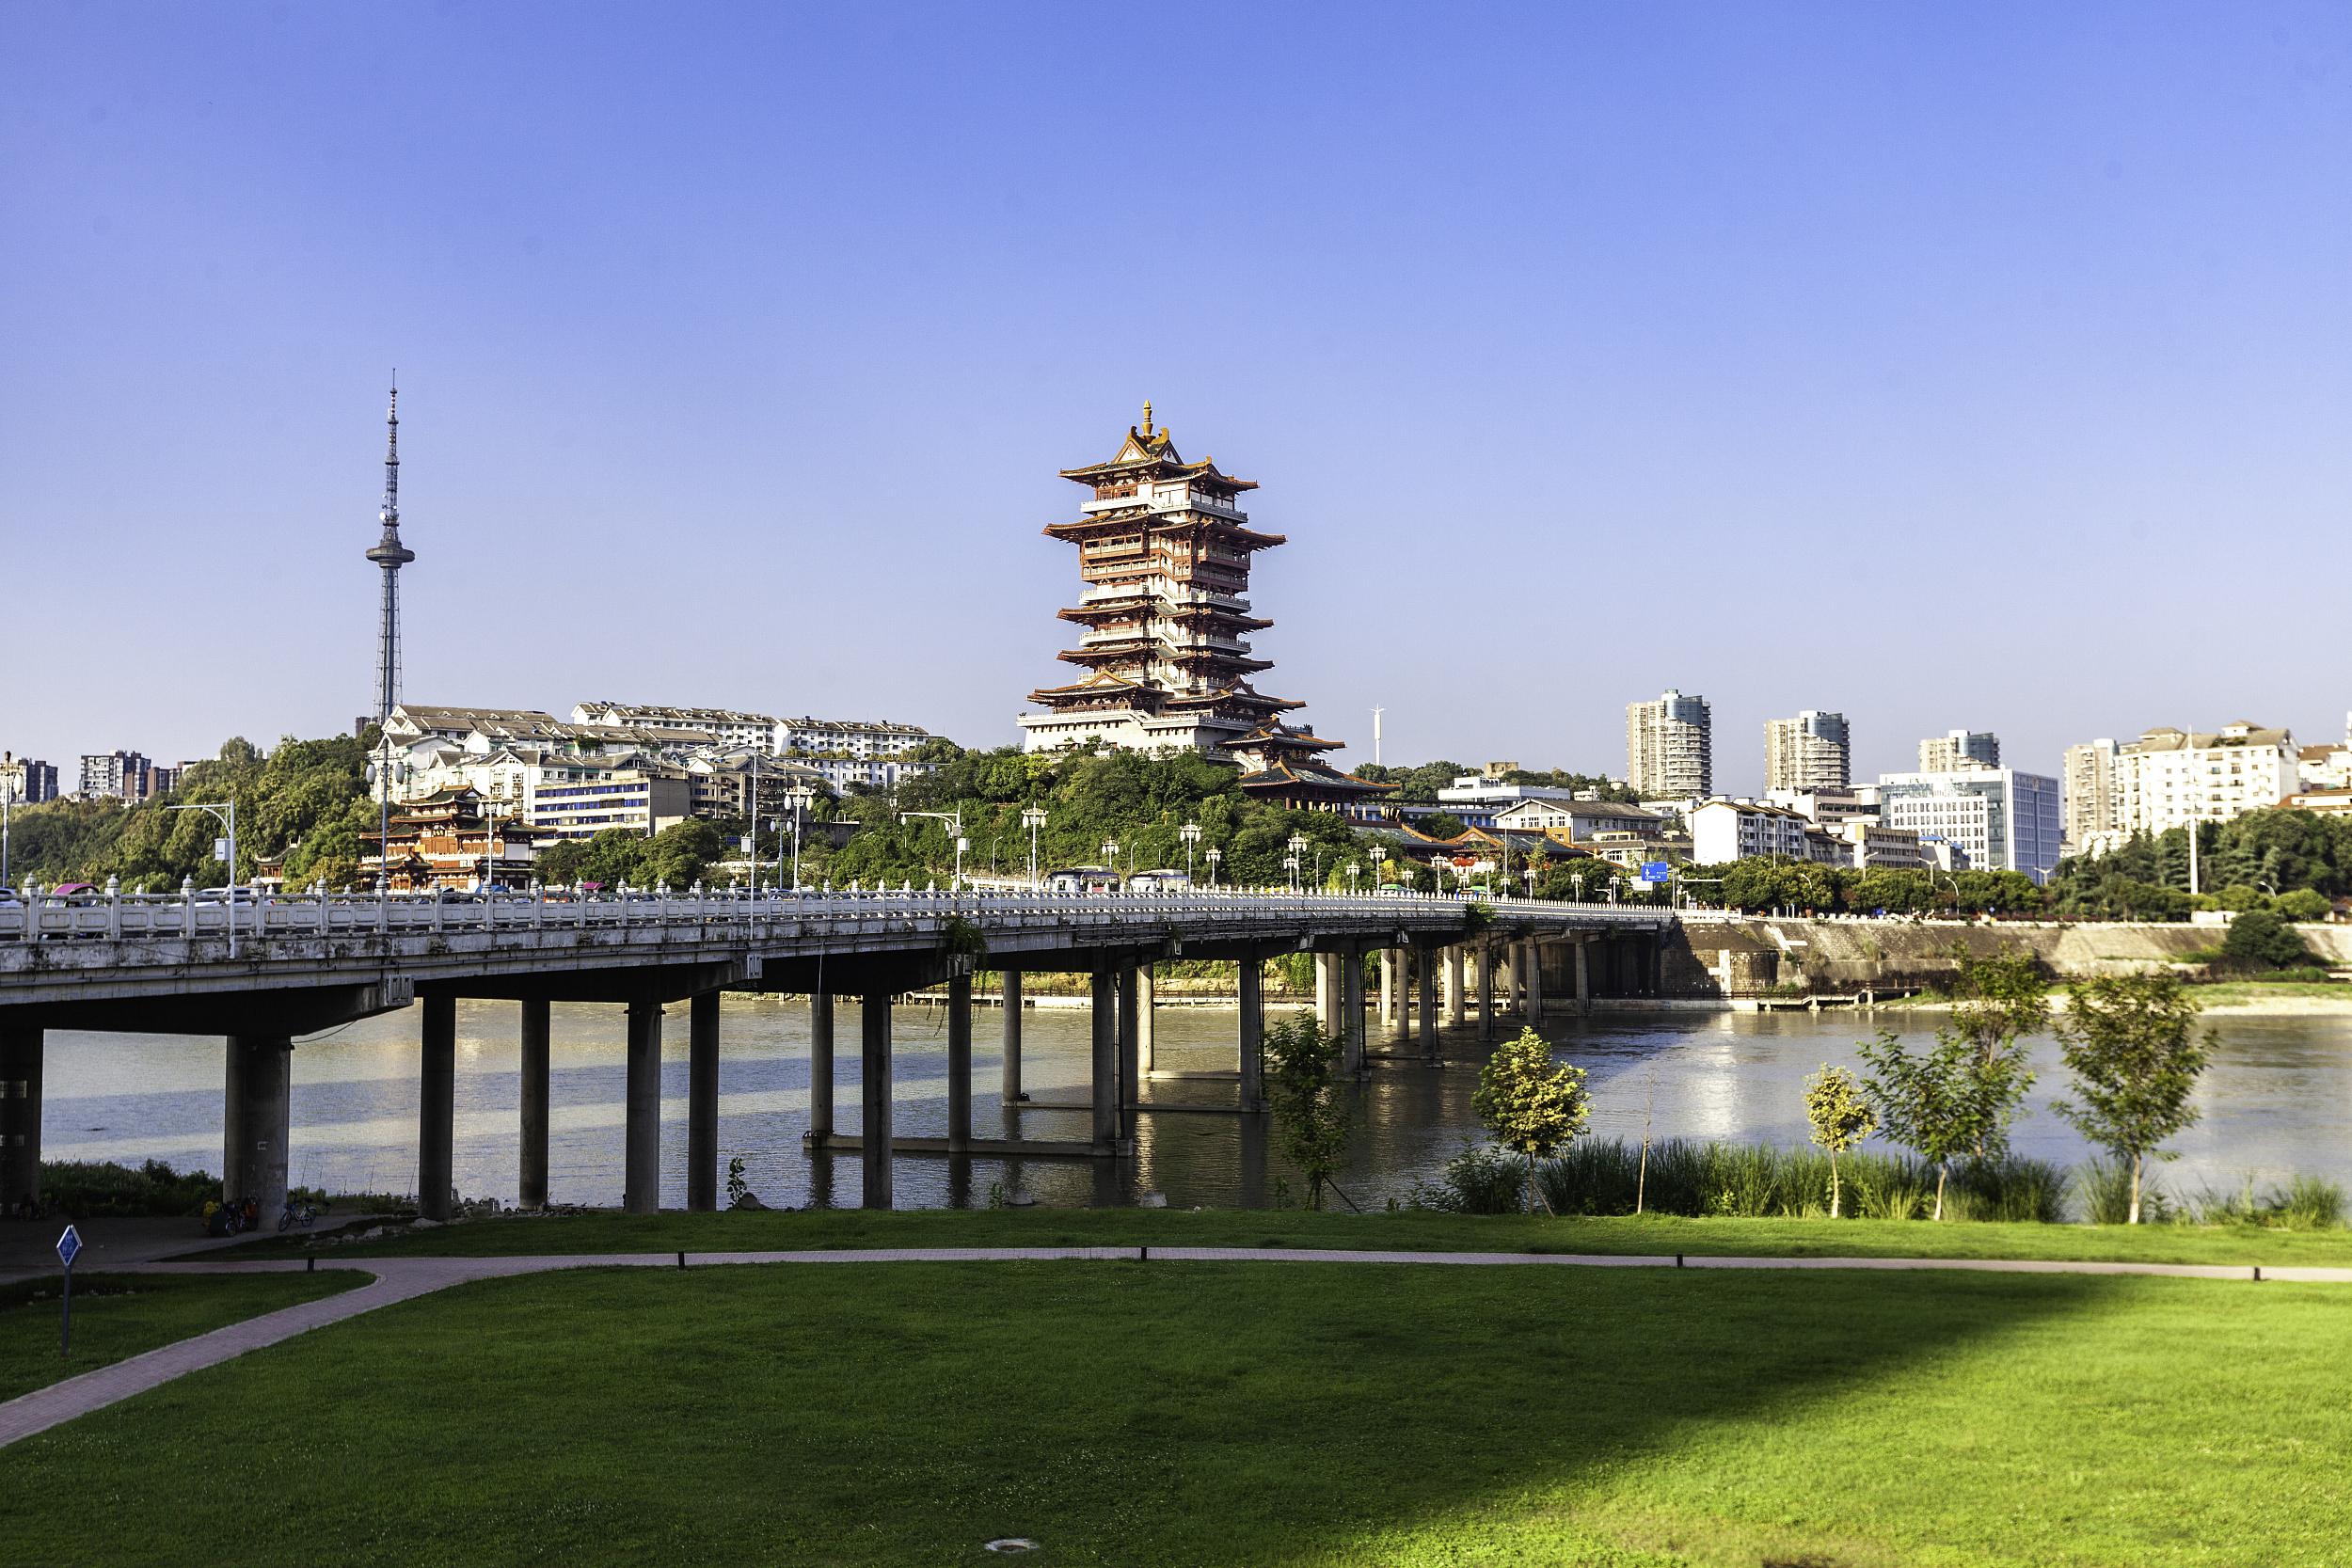 Yuewang Tower